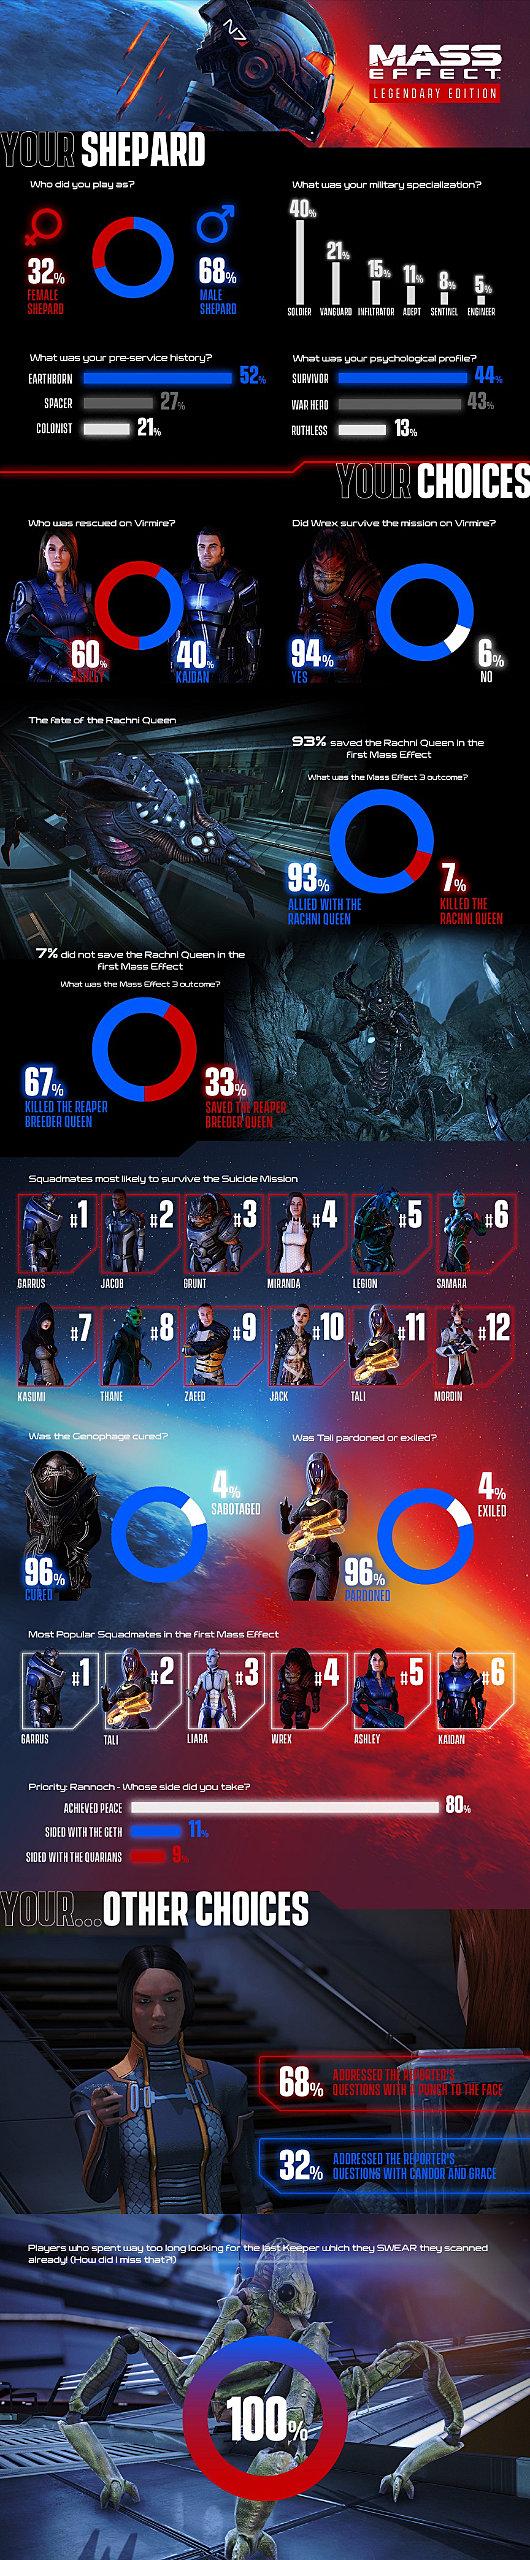 Mass Effect: Legendary Edition Infographic